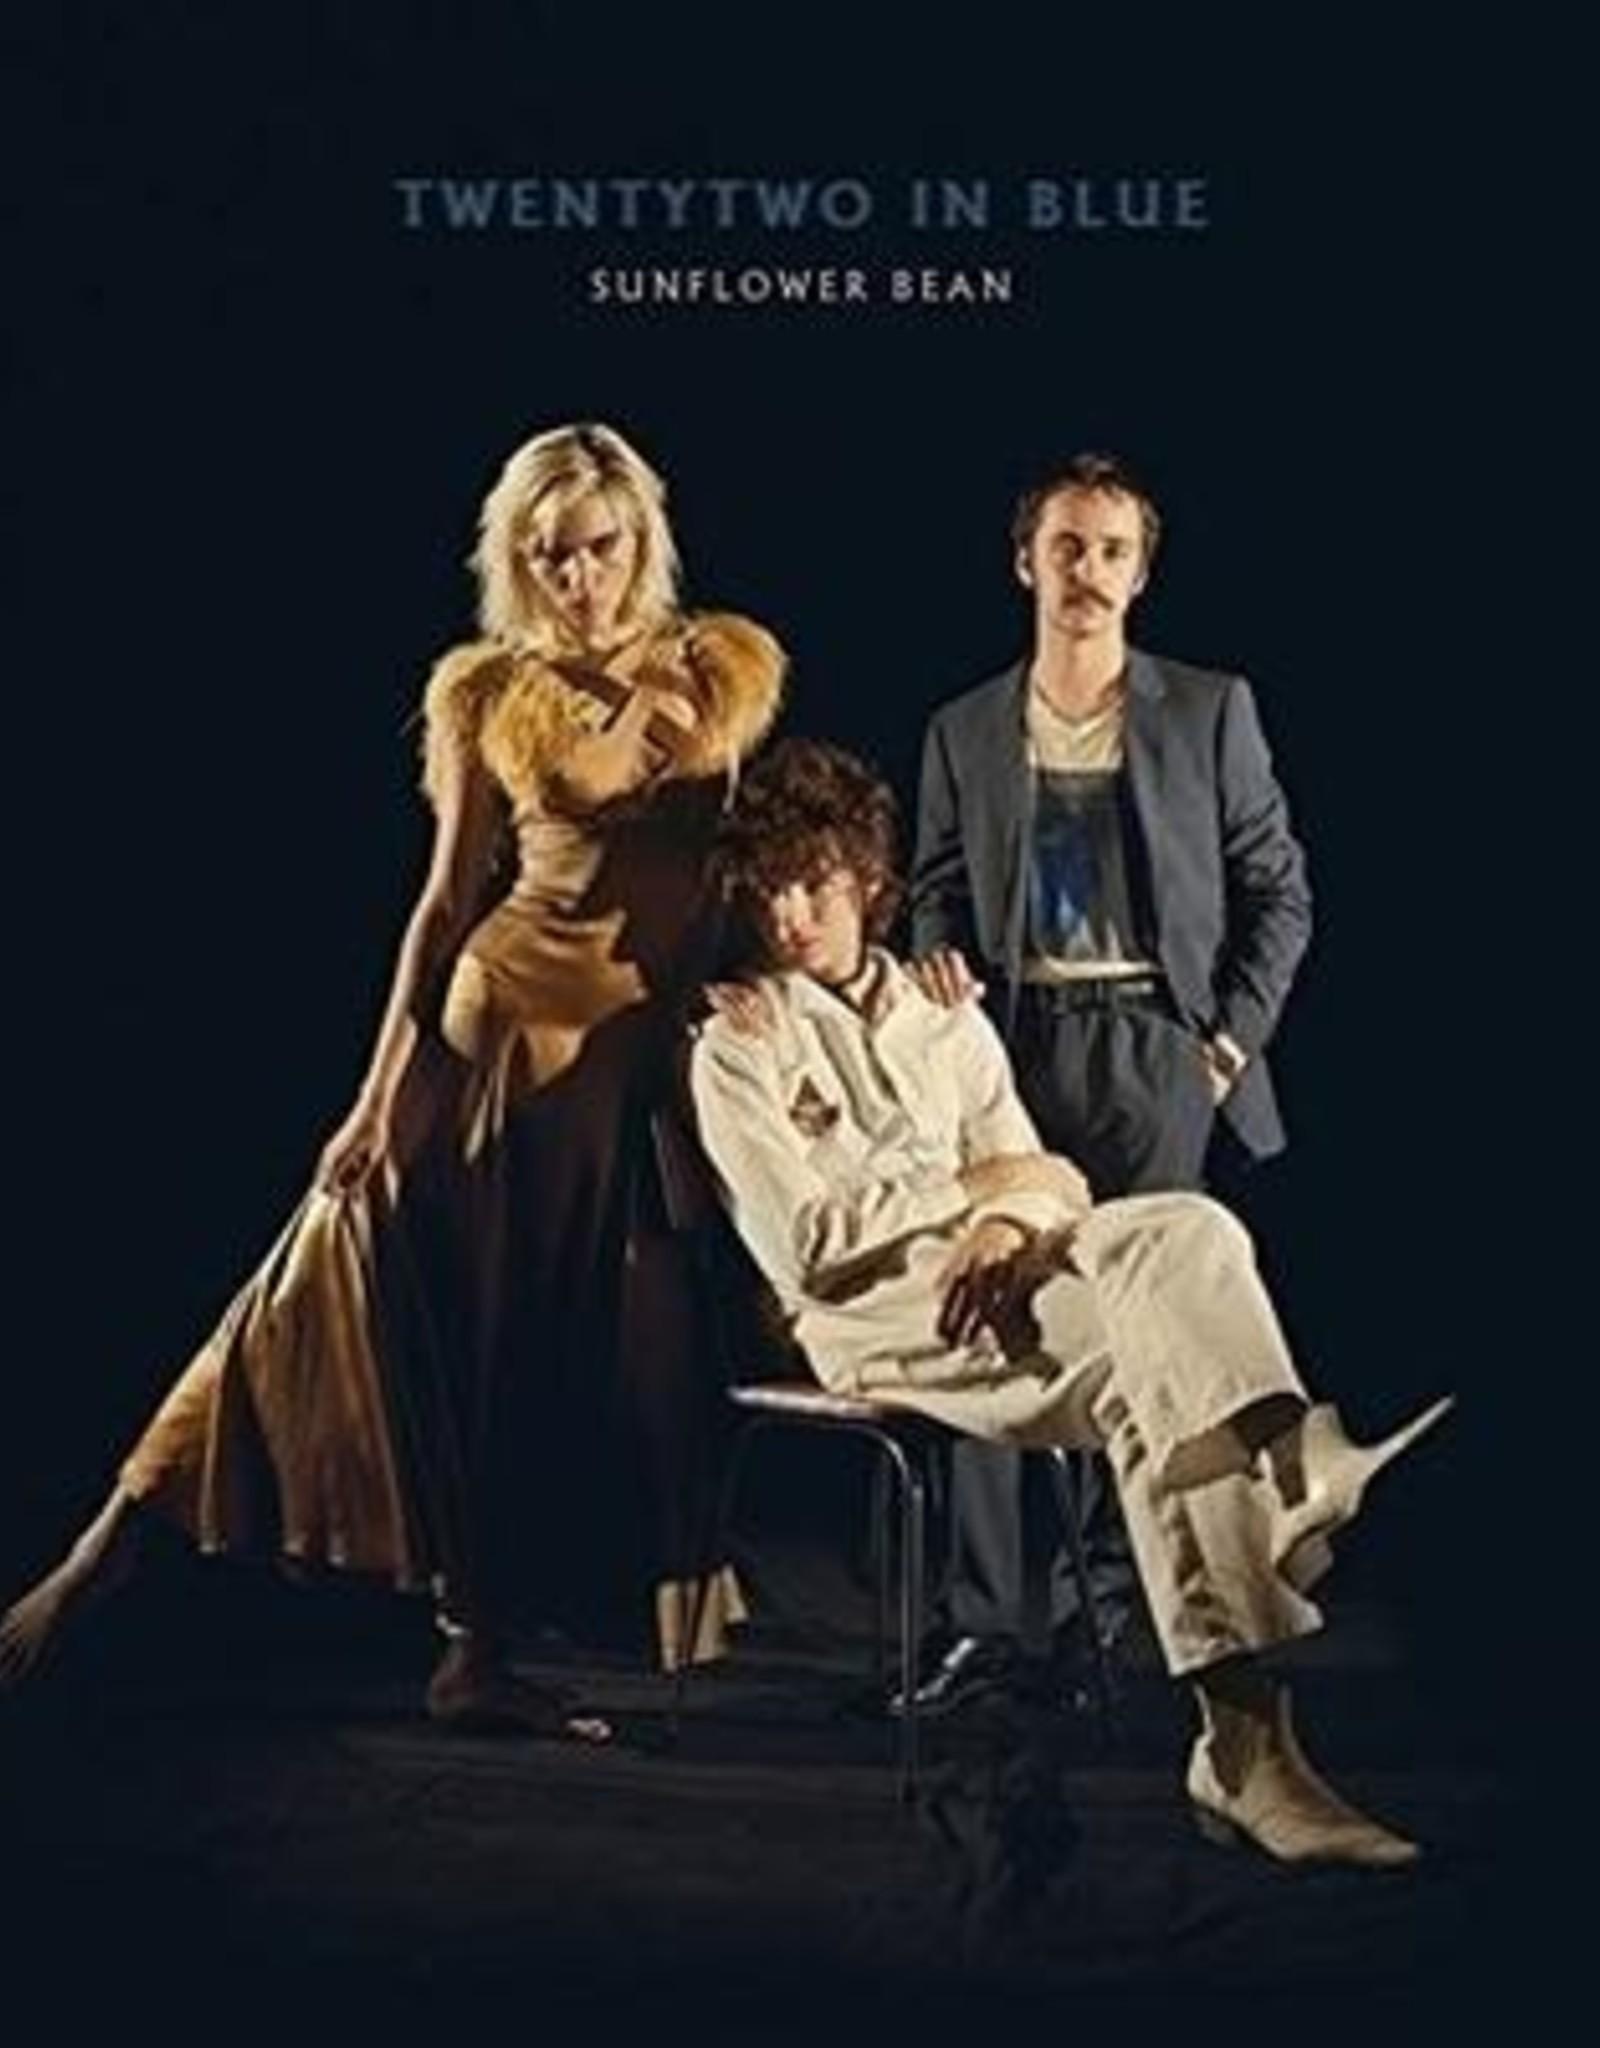 Sunflower Bean - Twentytwo In Blue (Indie Only Light Blue Vinyl)